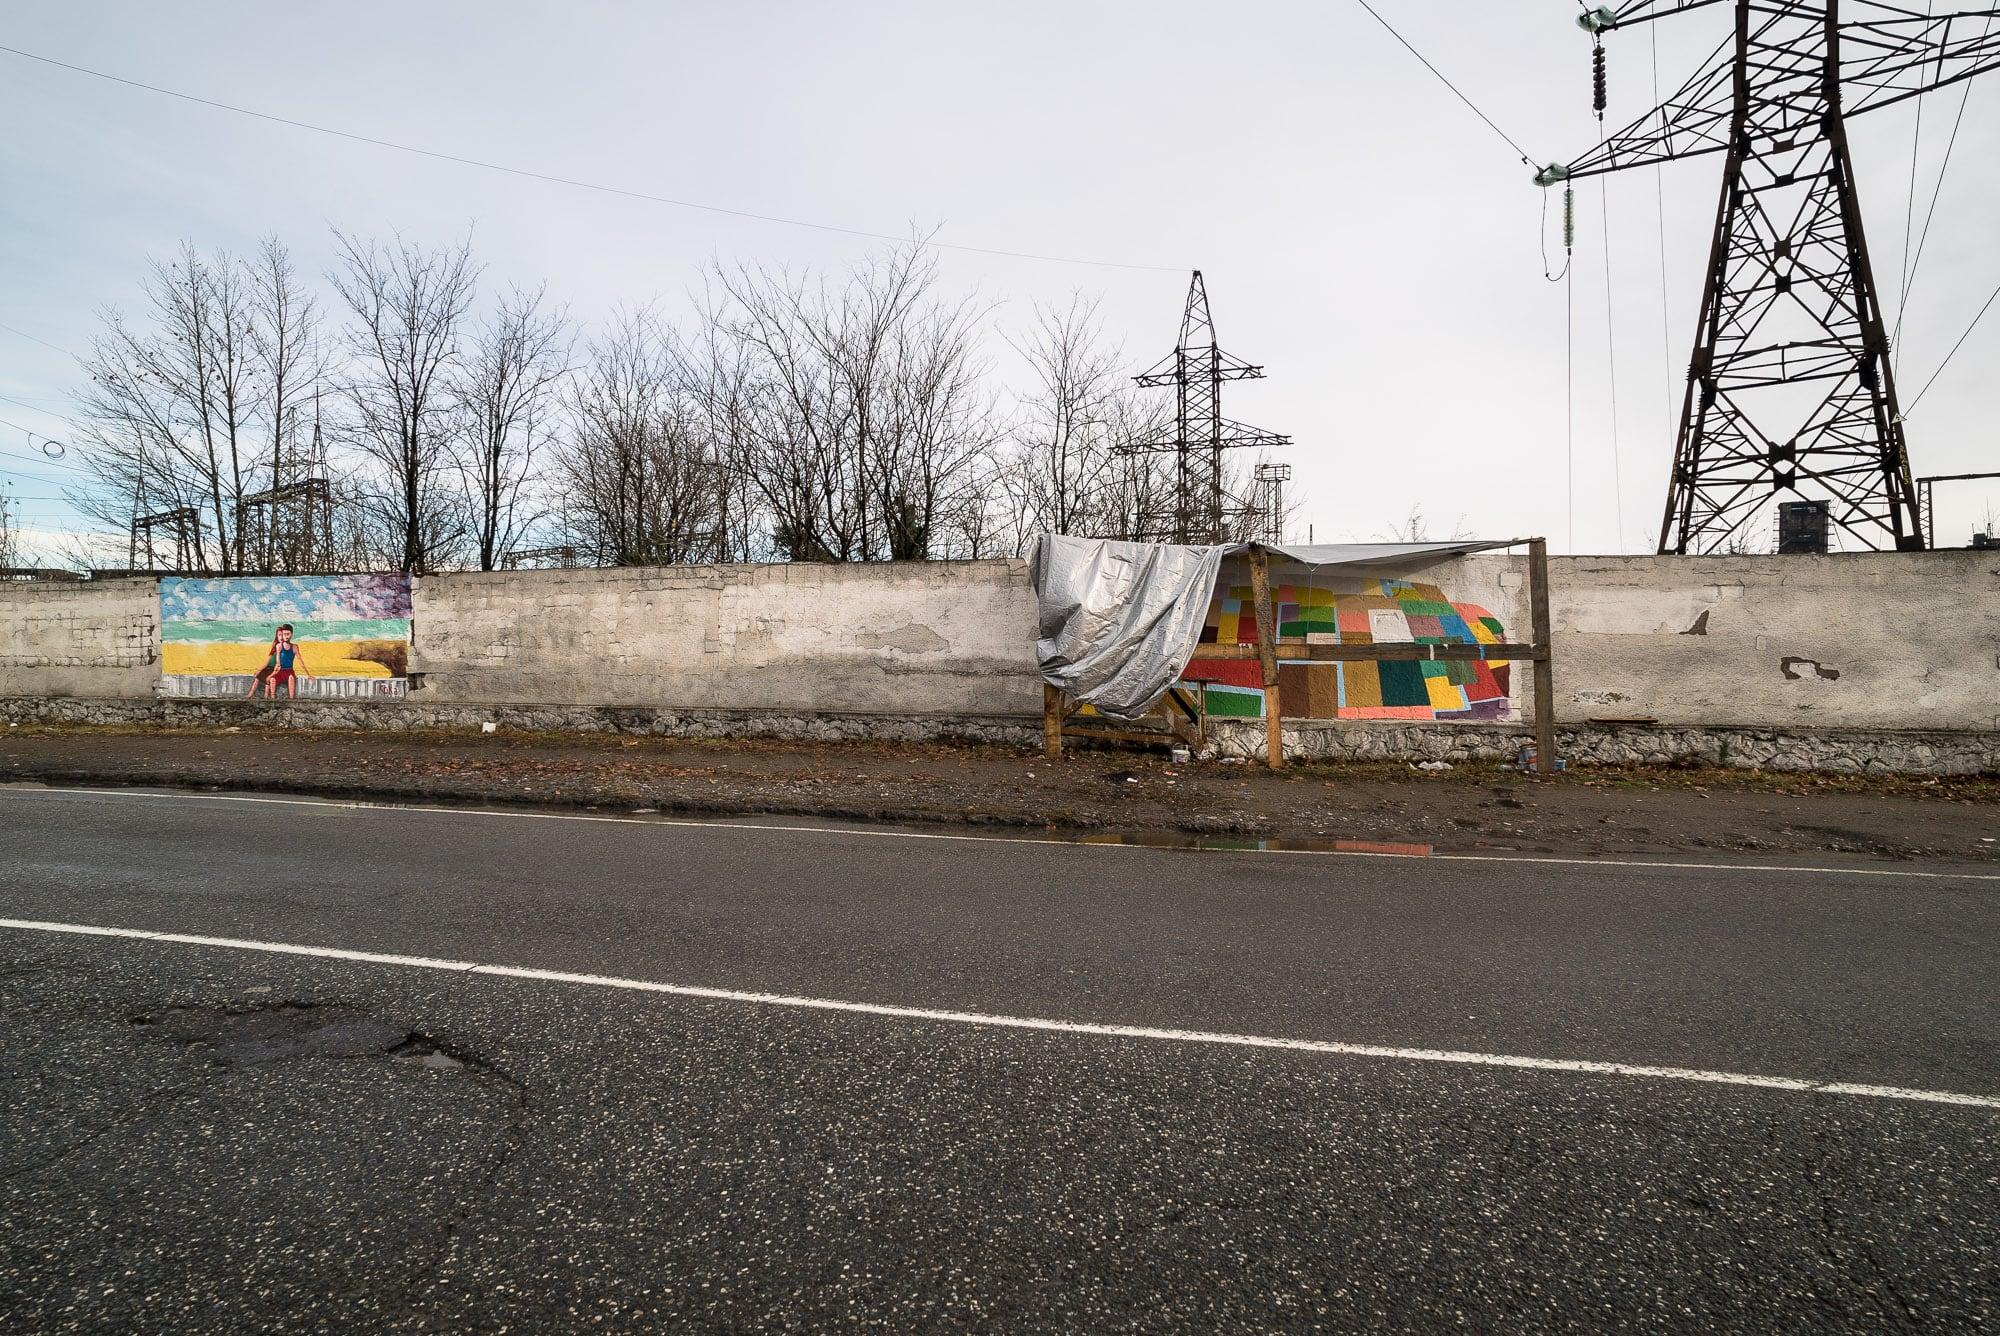 roadside murals